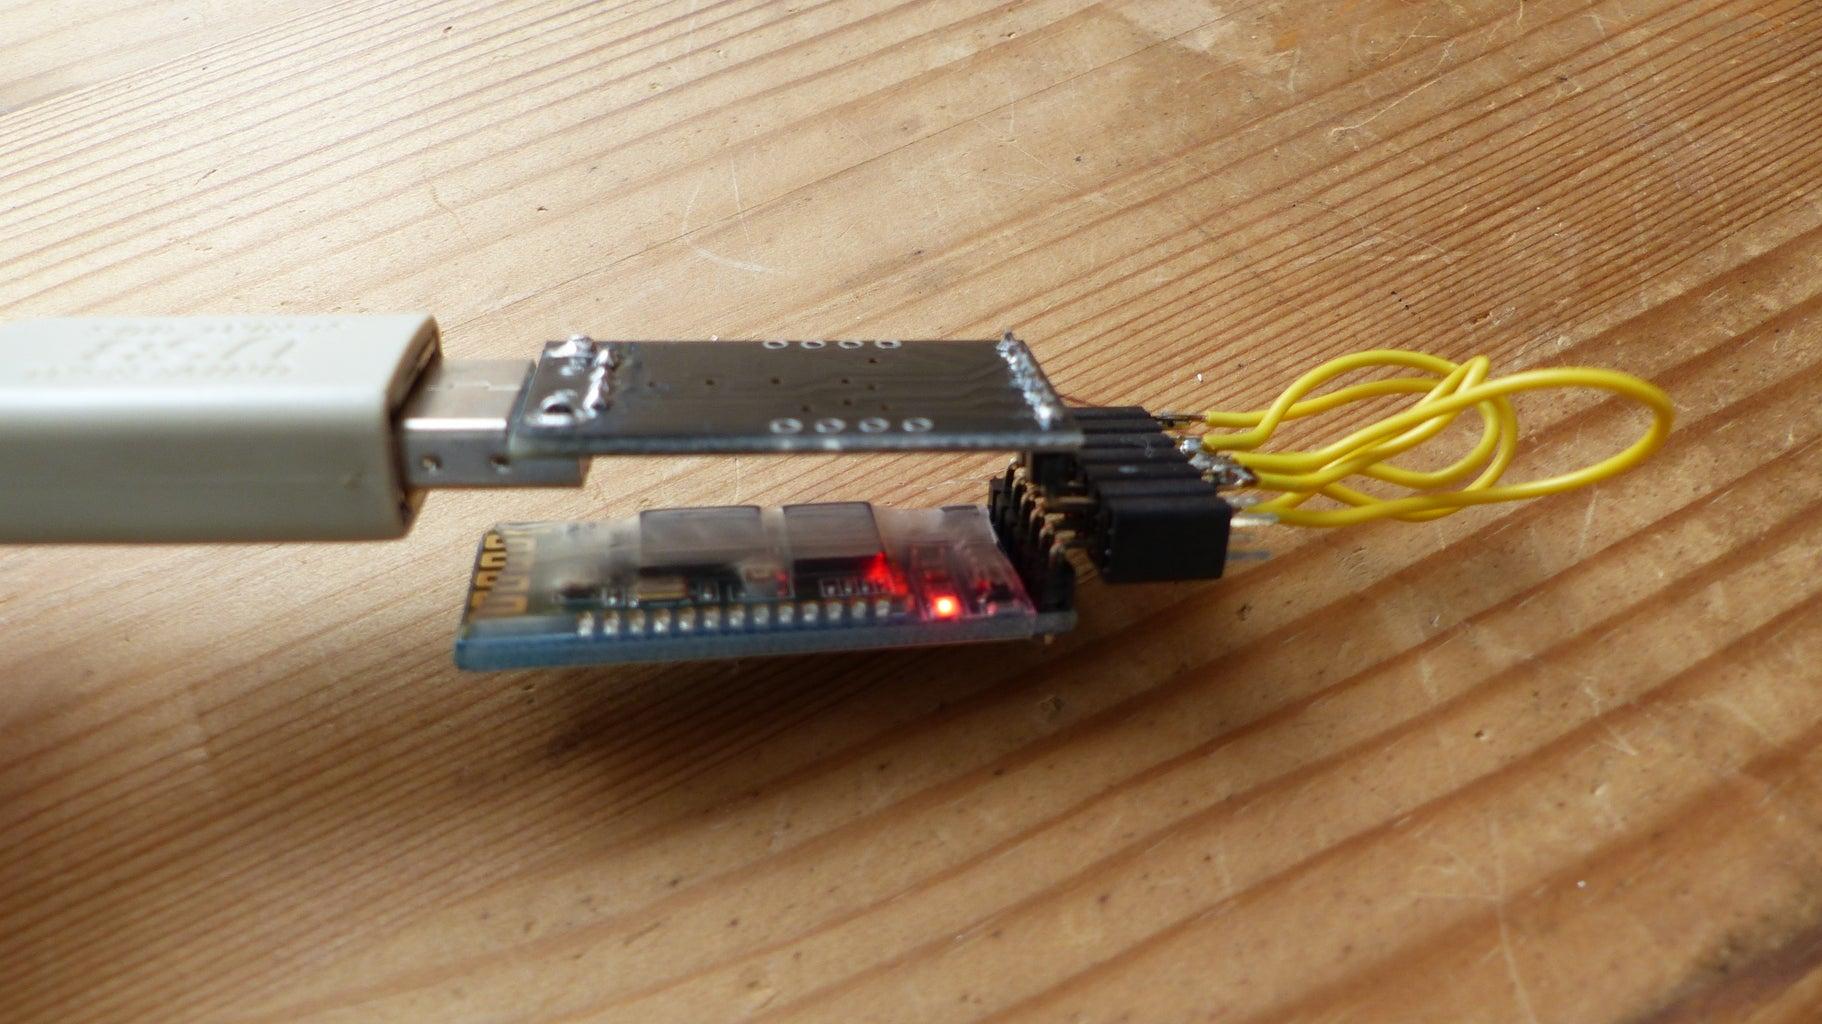 Preparing the Bluetooth Module